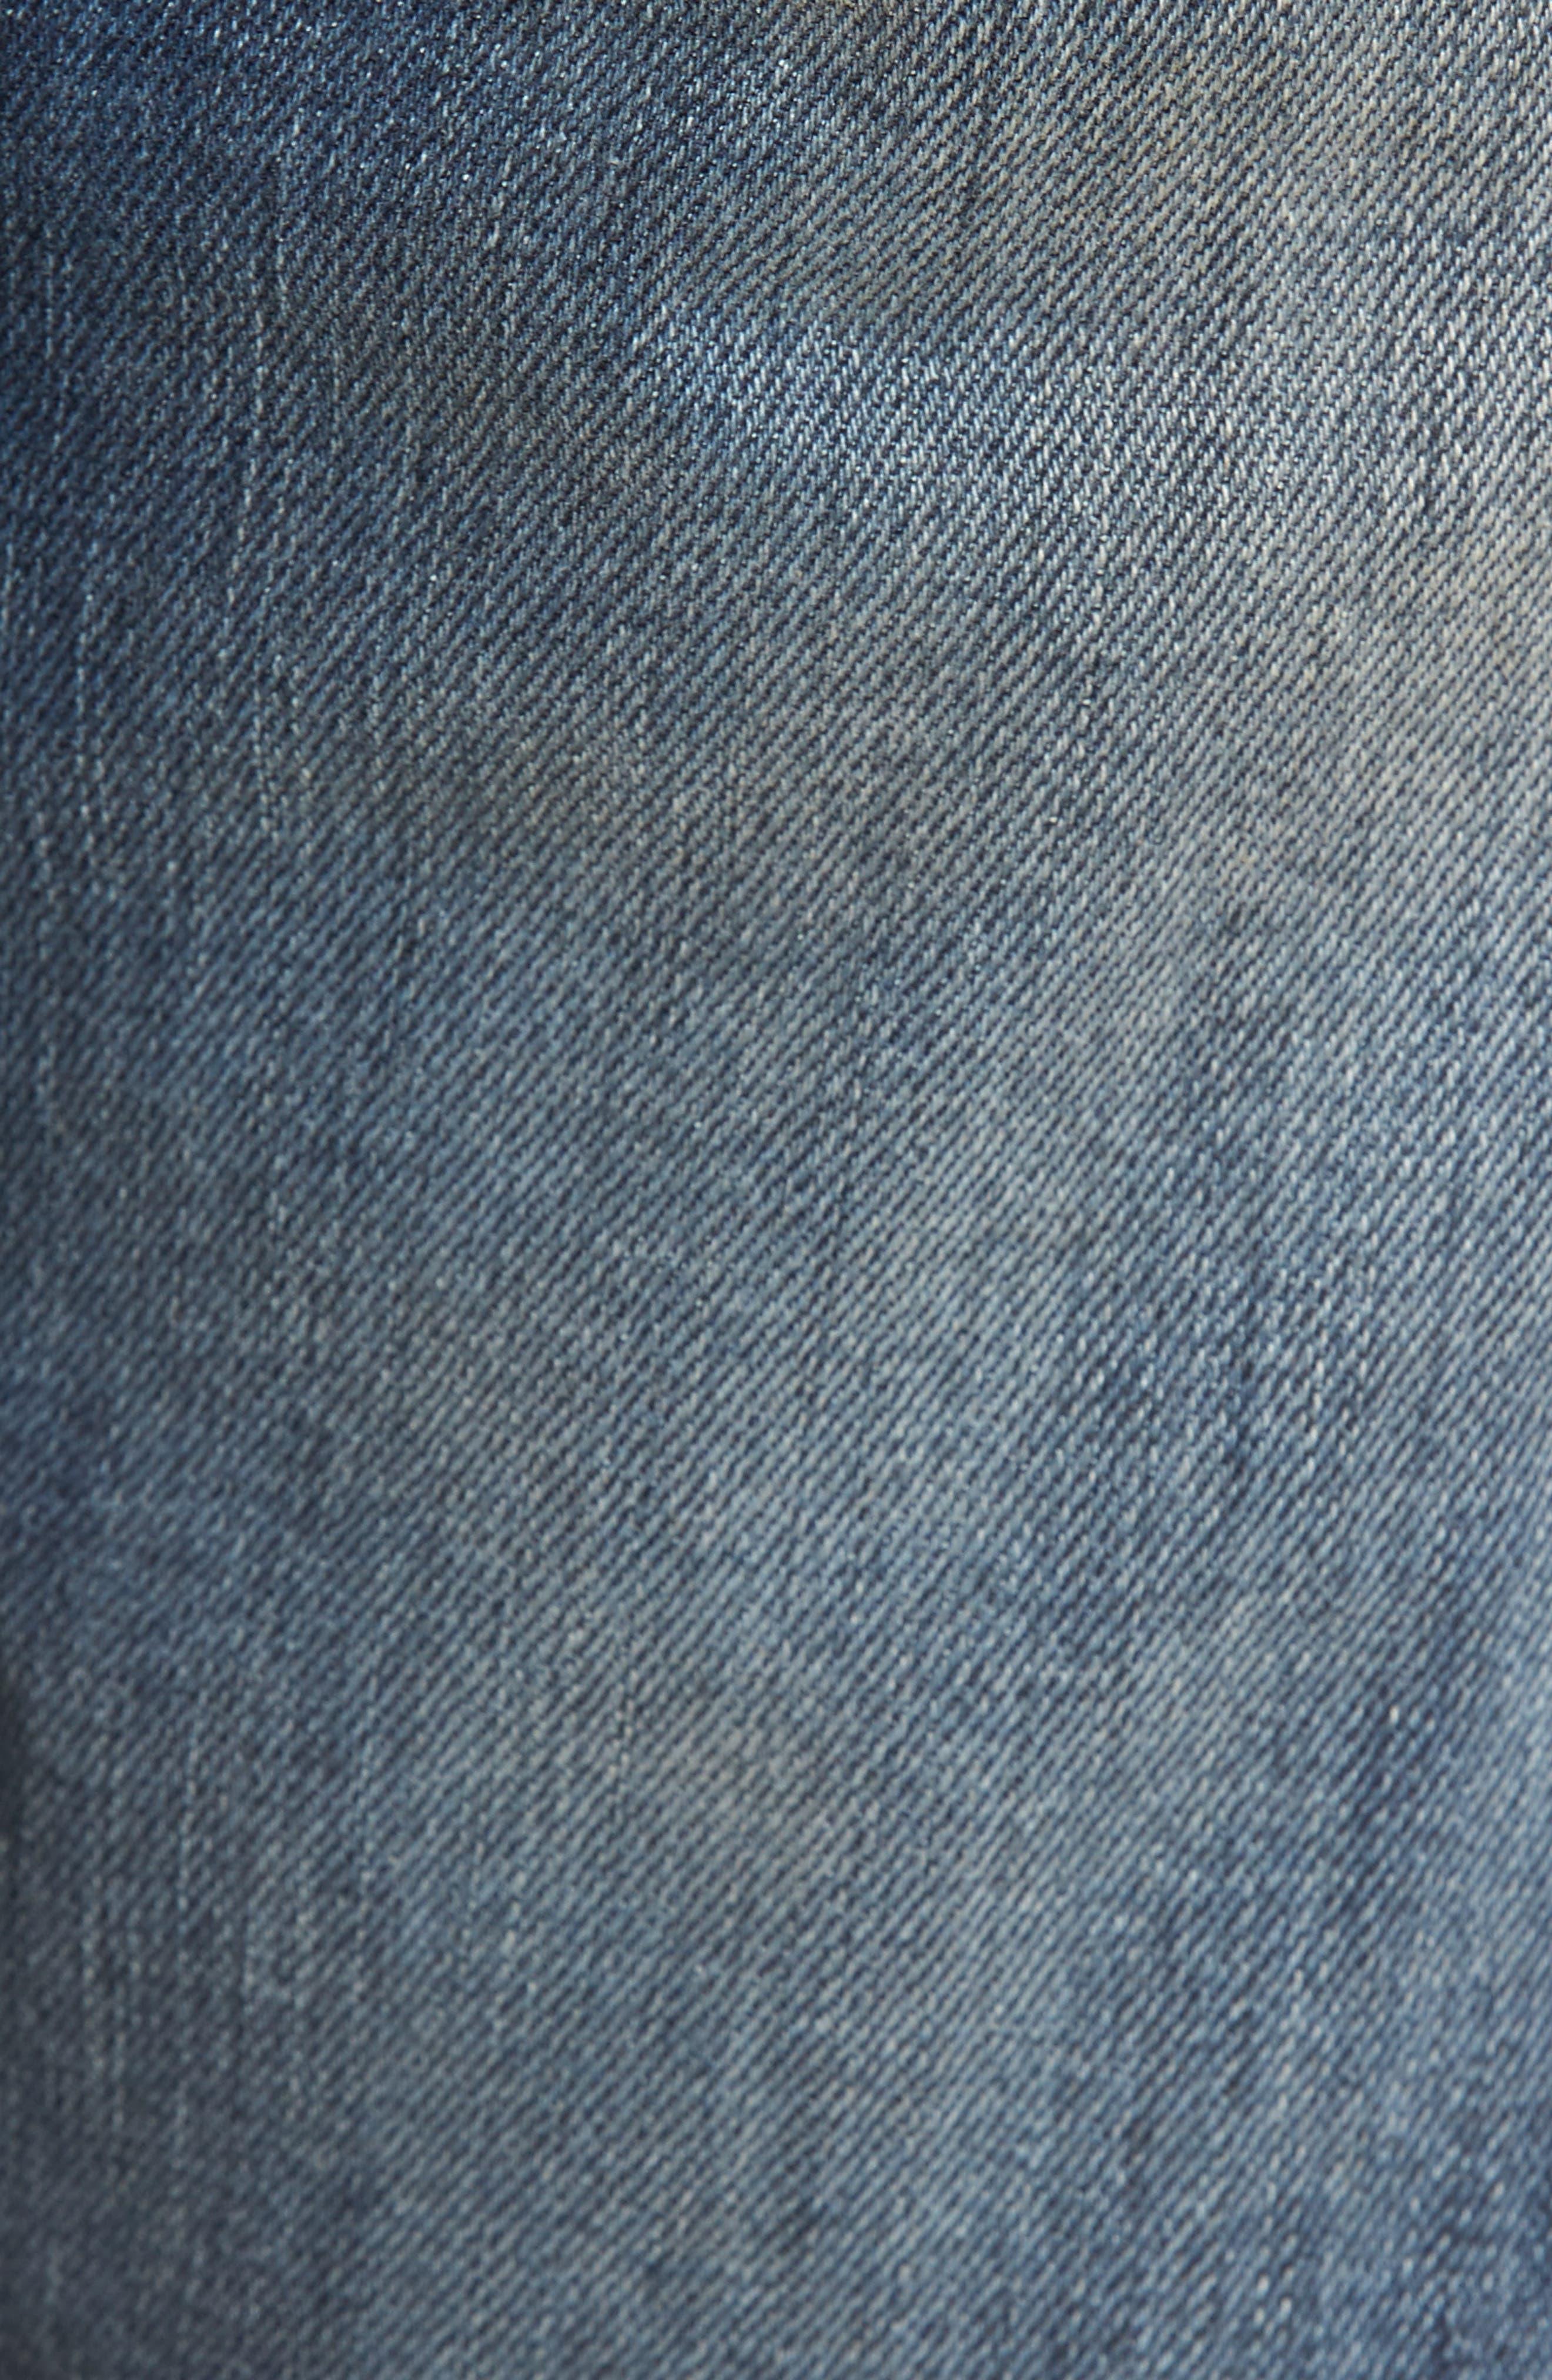 Blinder Biker Moto Skinny Fit Jeans,                             Alternate thumbnail 5, color,                             425